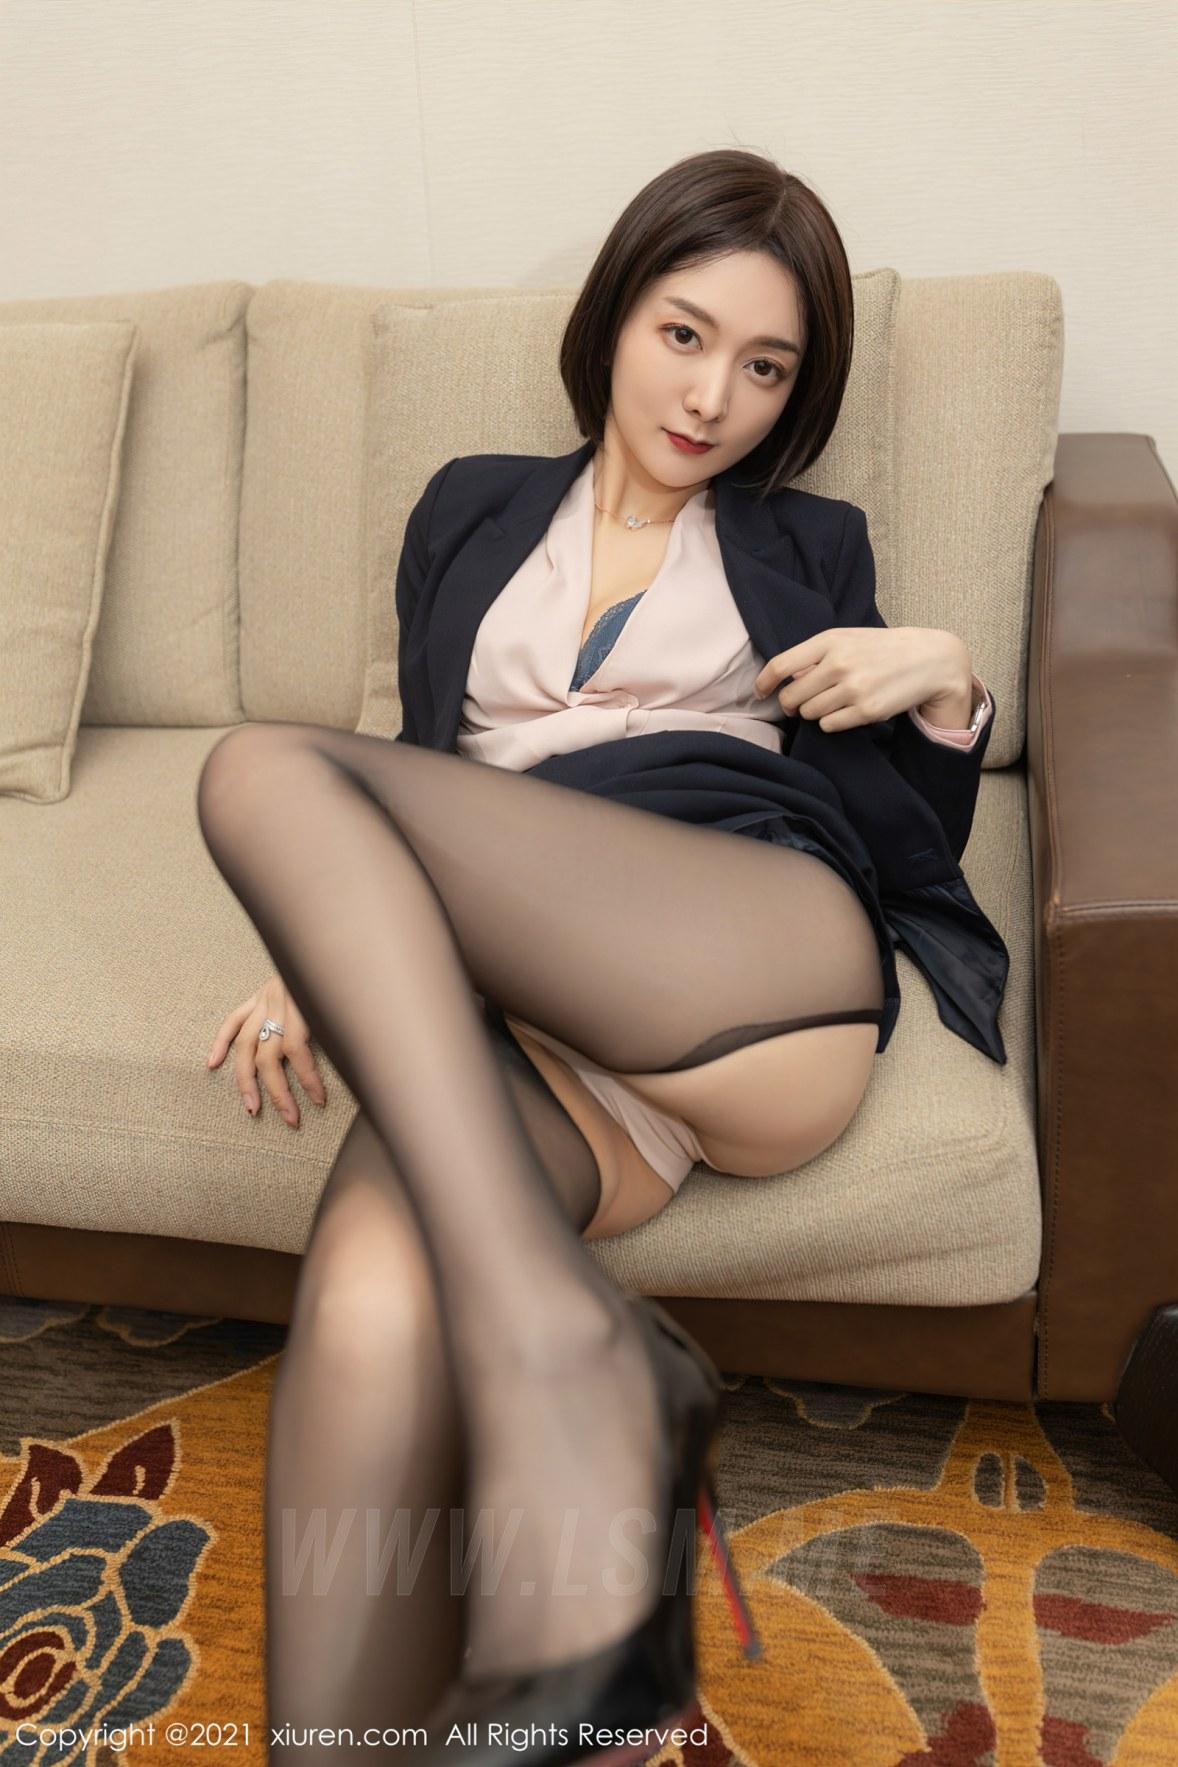 3745 029 rdd 3600 5400 - XiuRen 秀人 No.3745 保险销售主题 Angela小热巴 性感写真33 - 秀人网 -【免费在线写真】【丽人丝语】